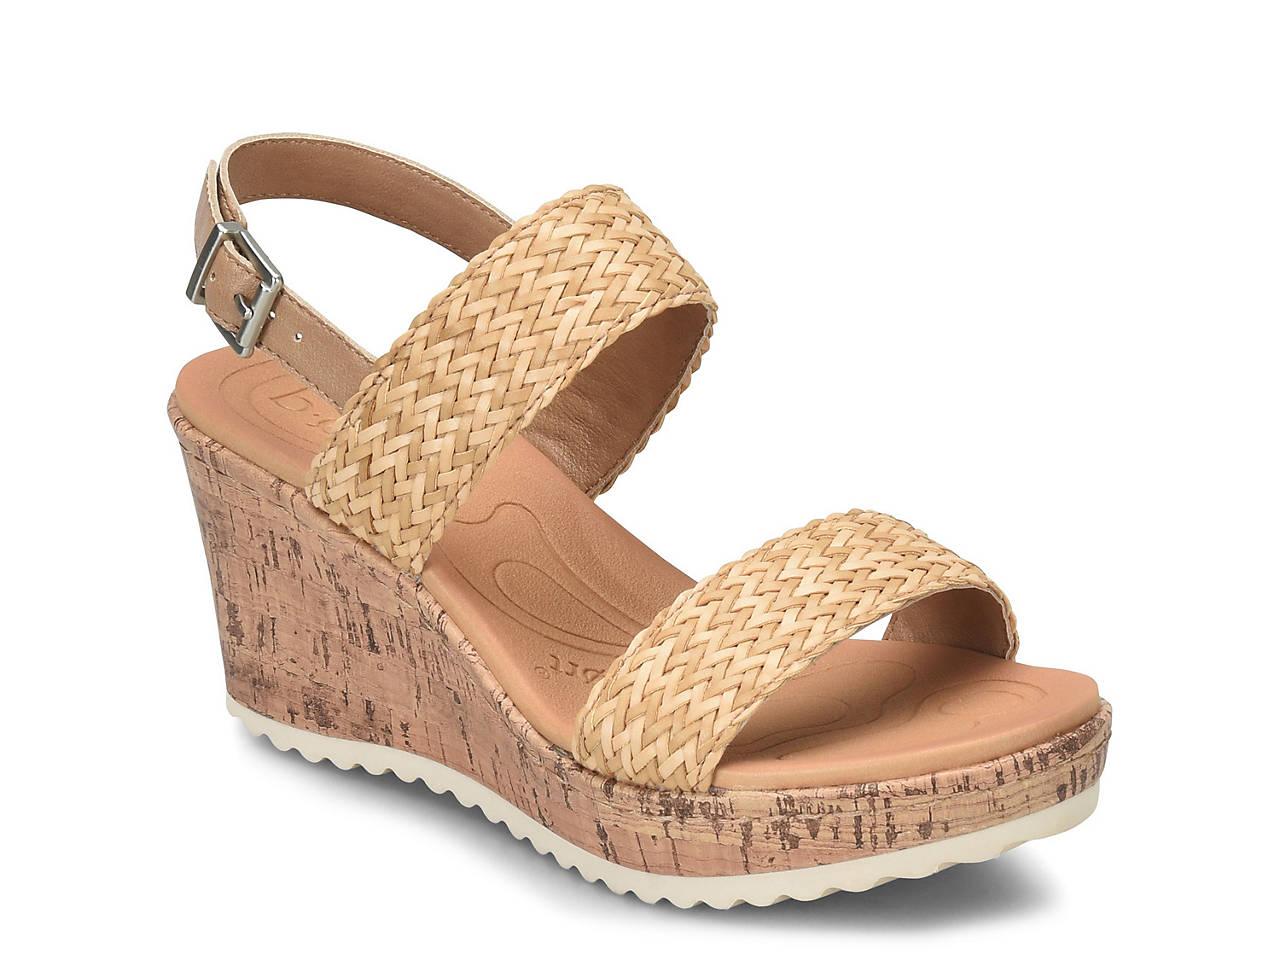 edf08fc07db b.o.c Remi Wedge Sandal Women s Shoes